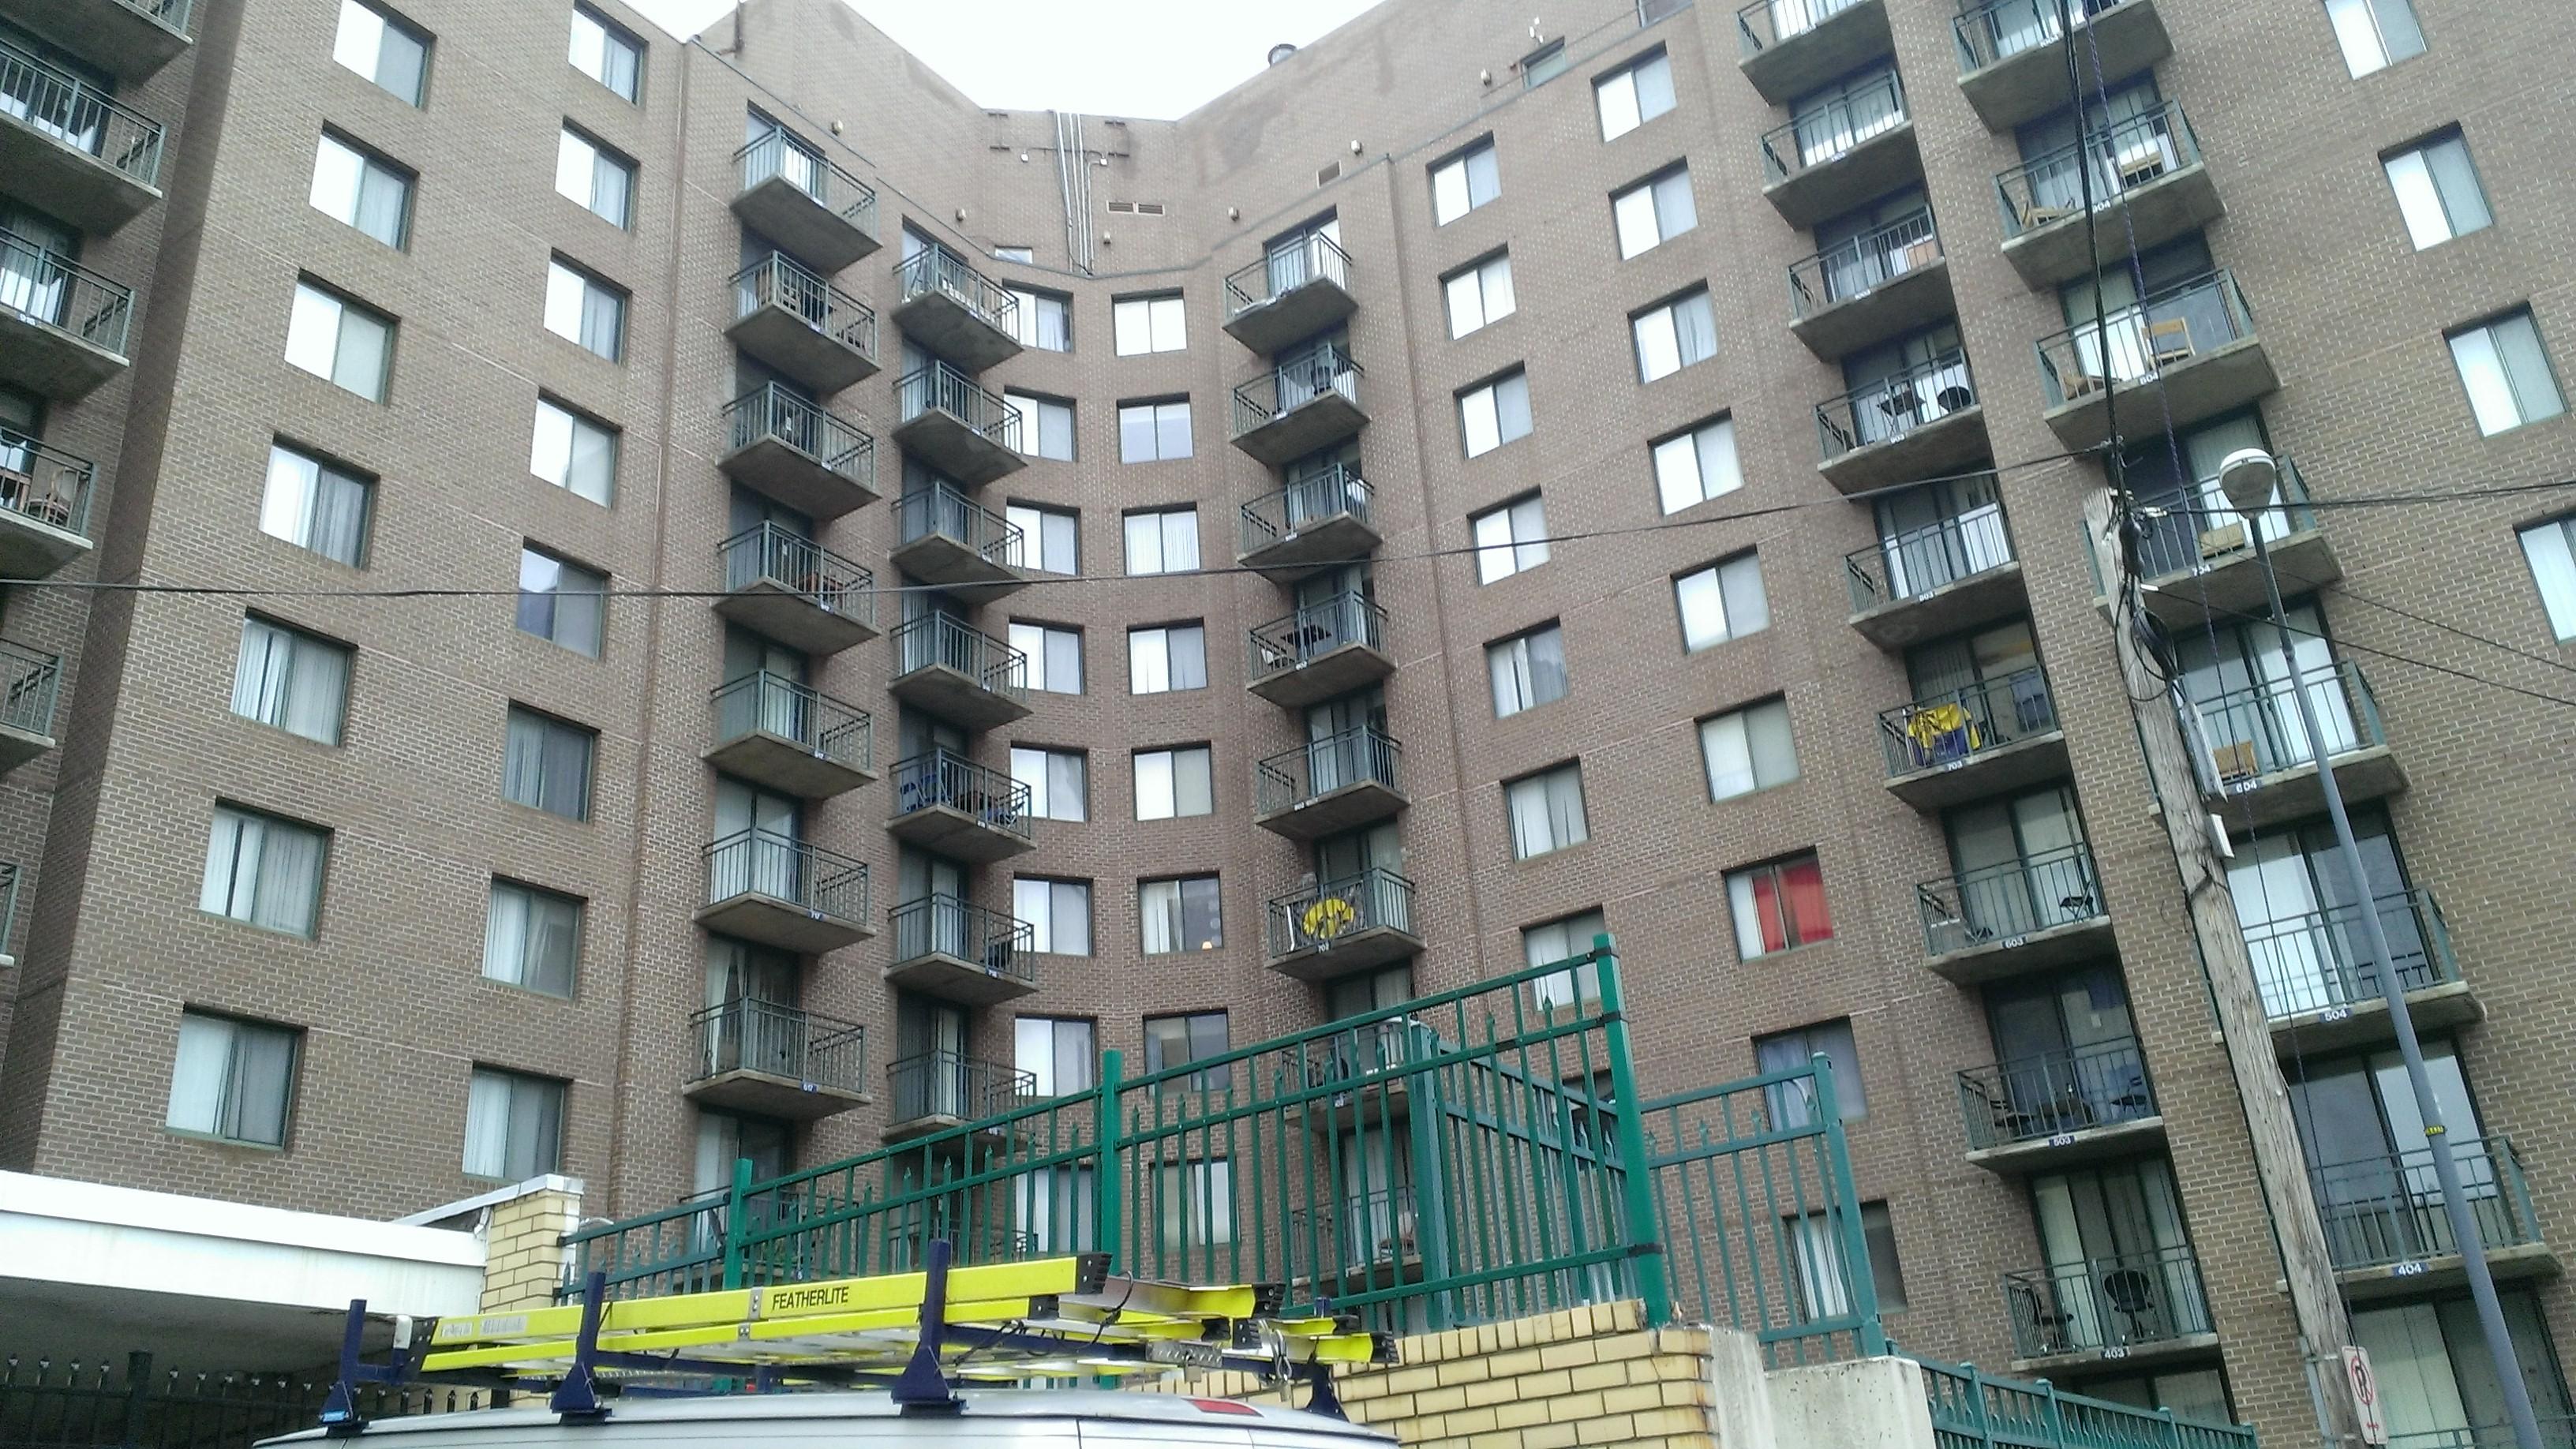 file city hall apartment complex snows court washington